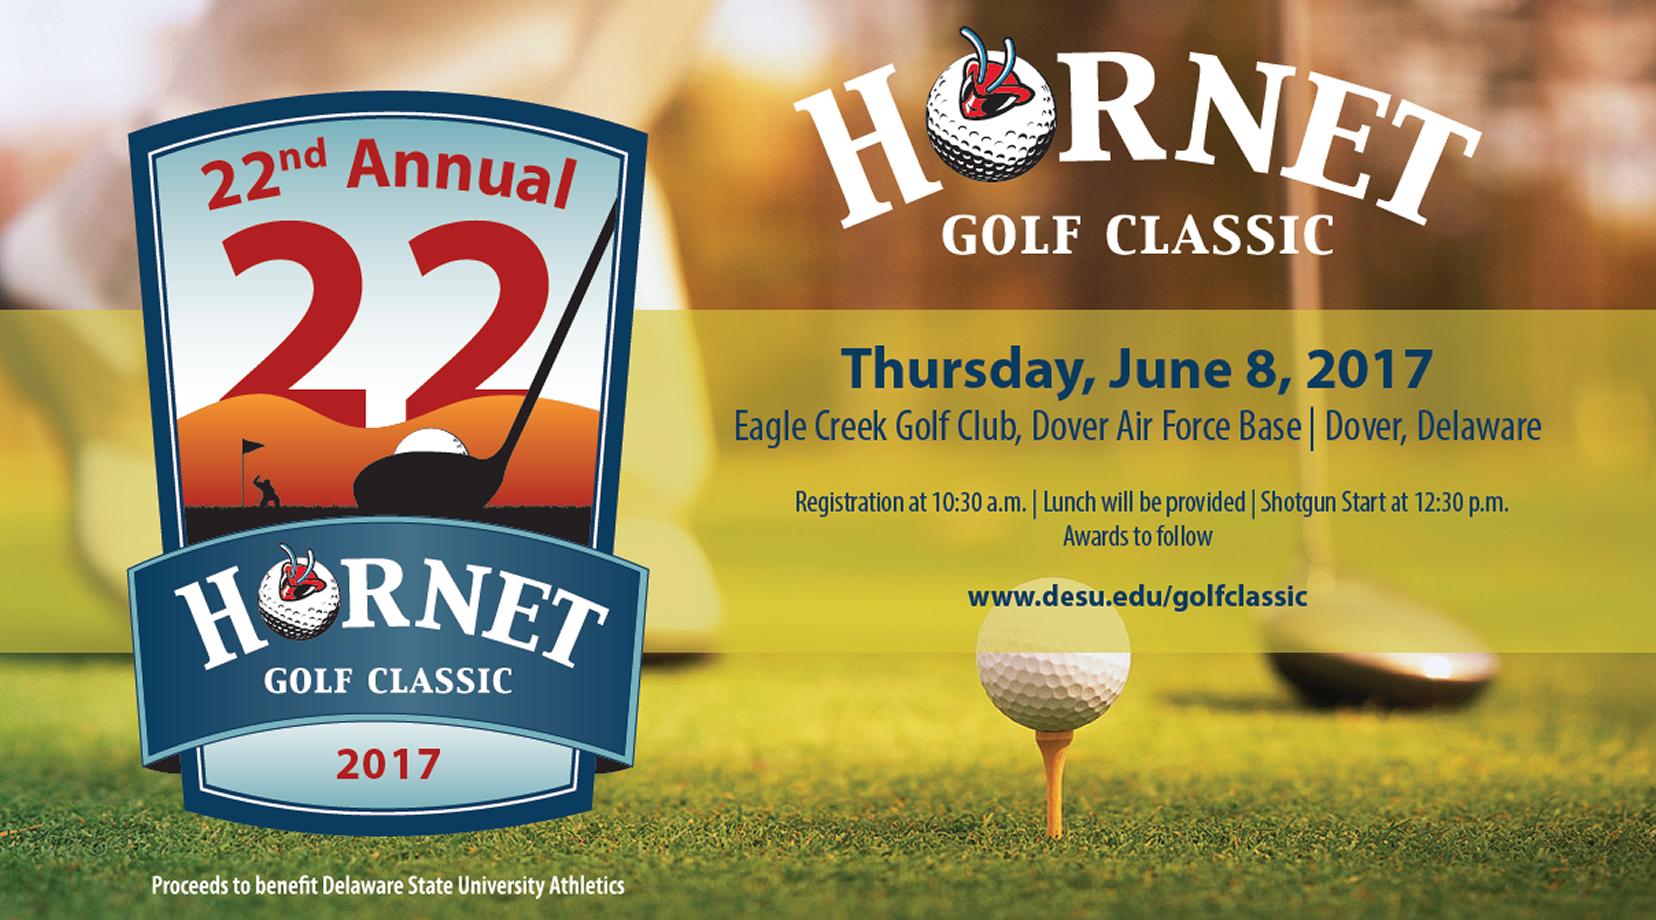 Hornet Golf Classic 2017